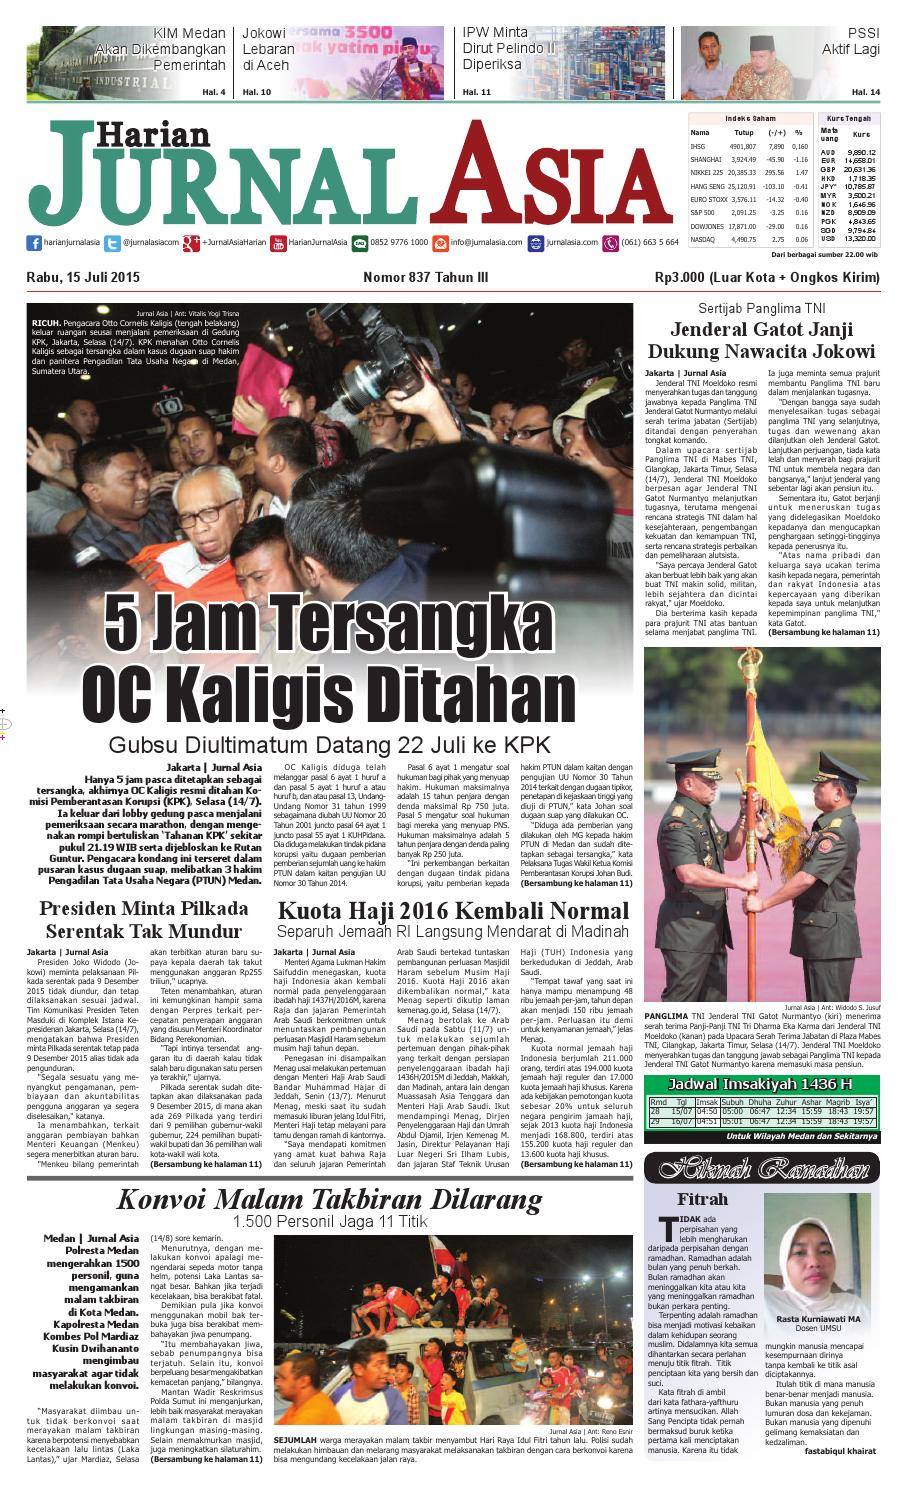 Harian Jurnal Asia Edisi Rabu 15 Juli 2015 By Produk Ukm Paul Aksesories Id Card Leather Kartu Pengenal Kulit Warna Tan Medan Issuu